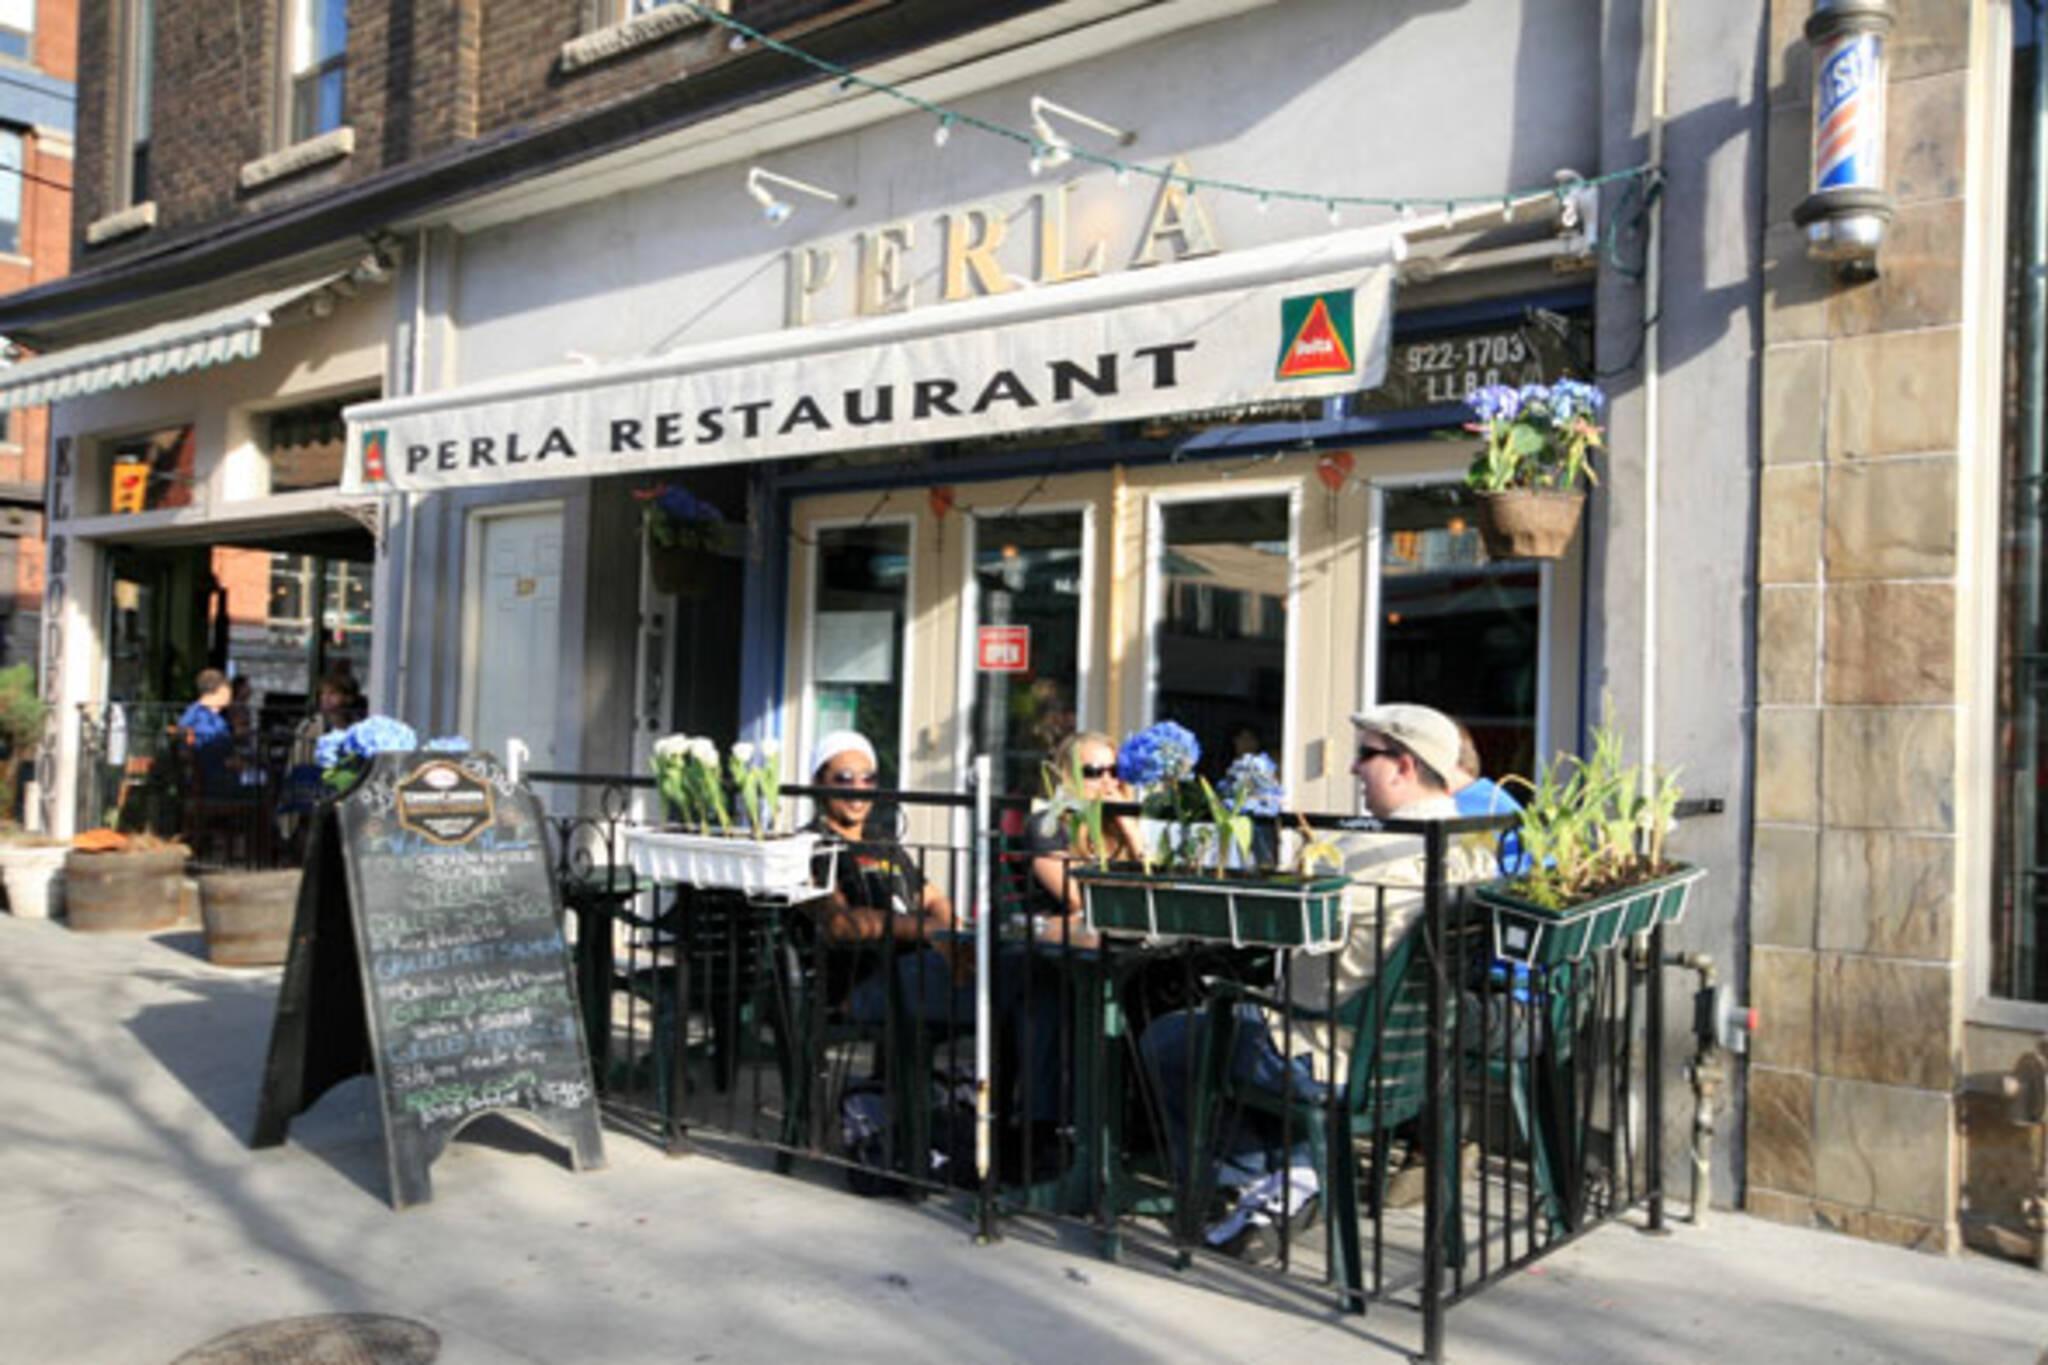 Perla Restaurant